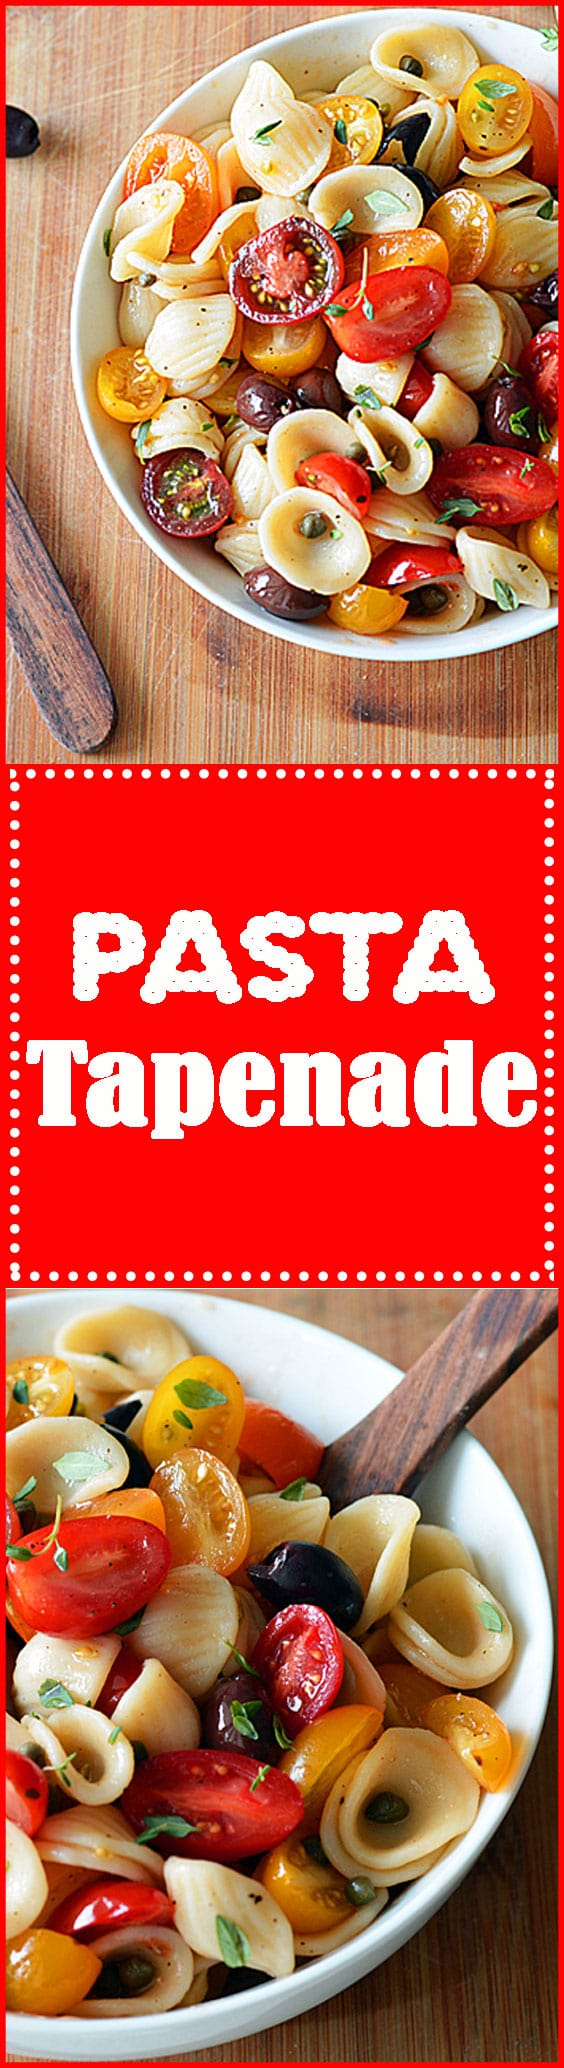 Pasta Tapenade